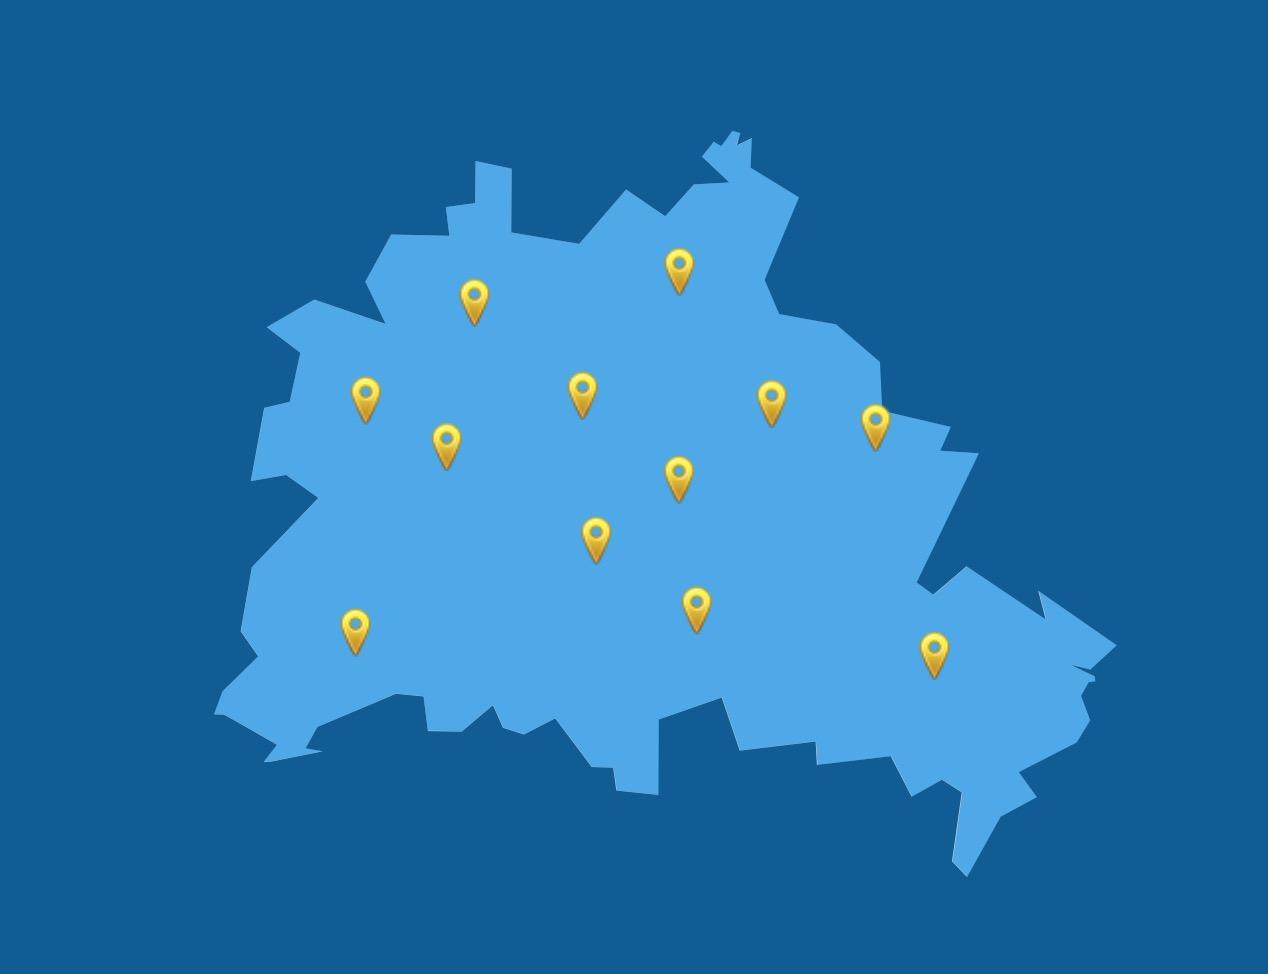 Live COVID-19 Coronavirus karte Berlin